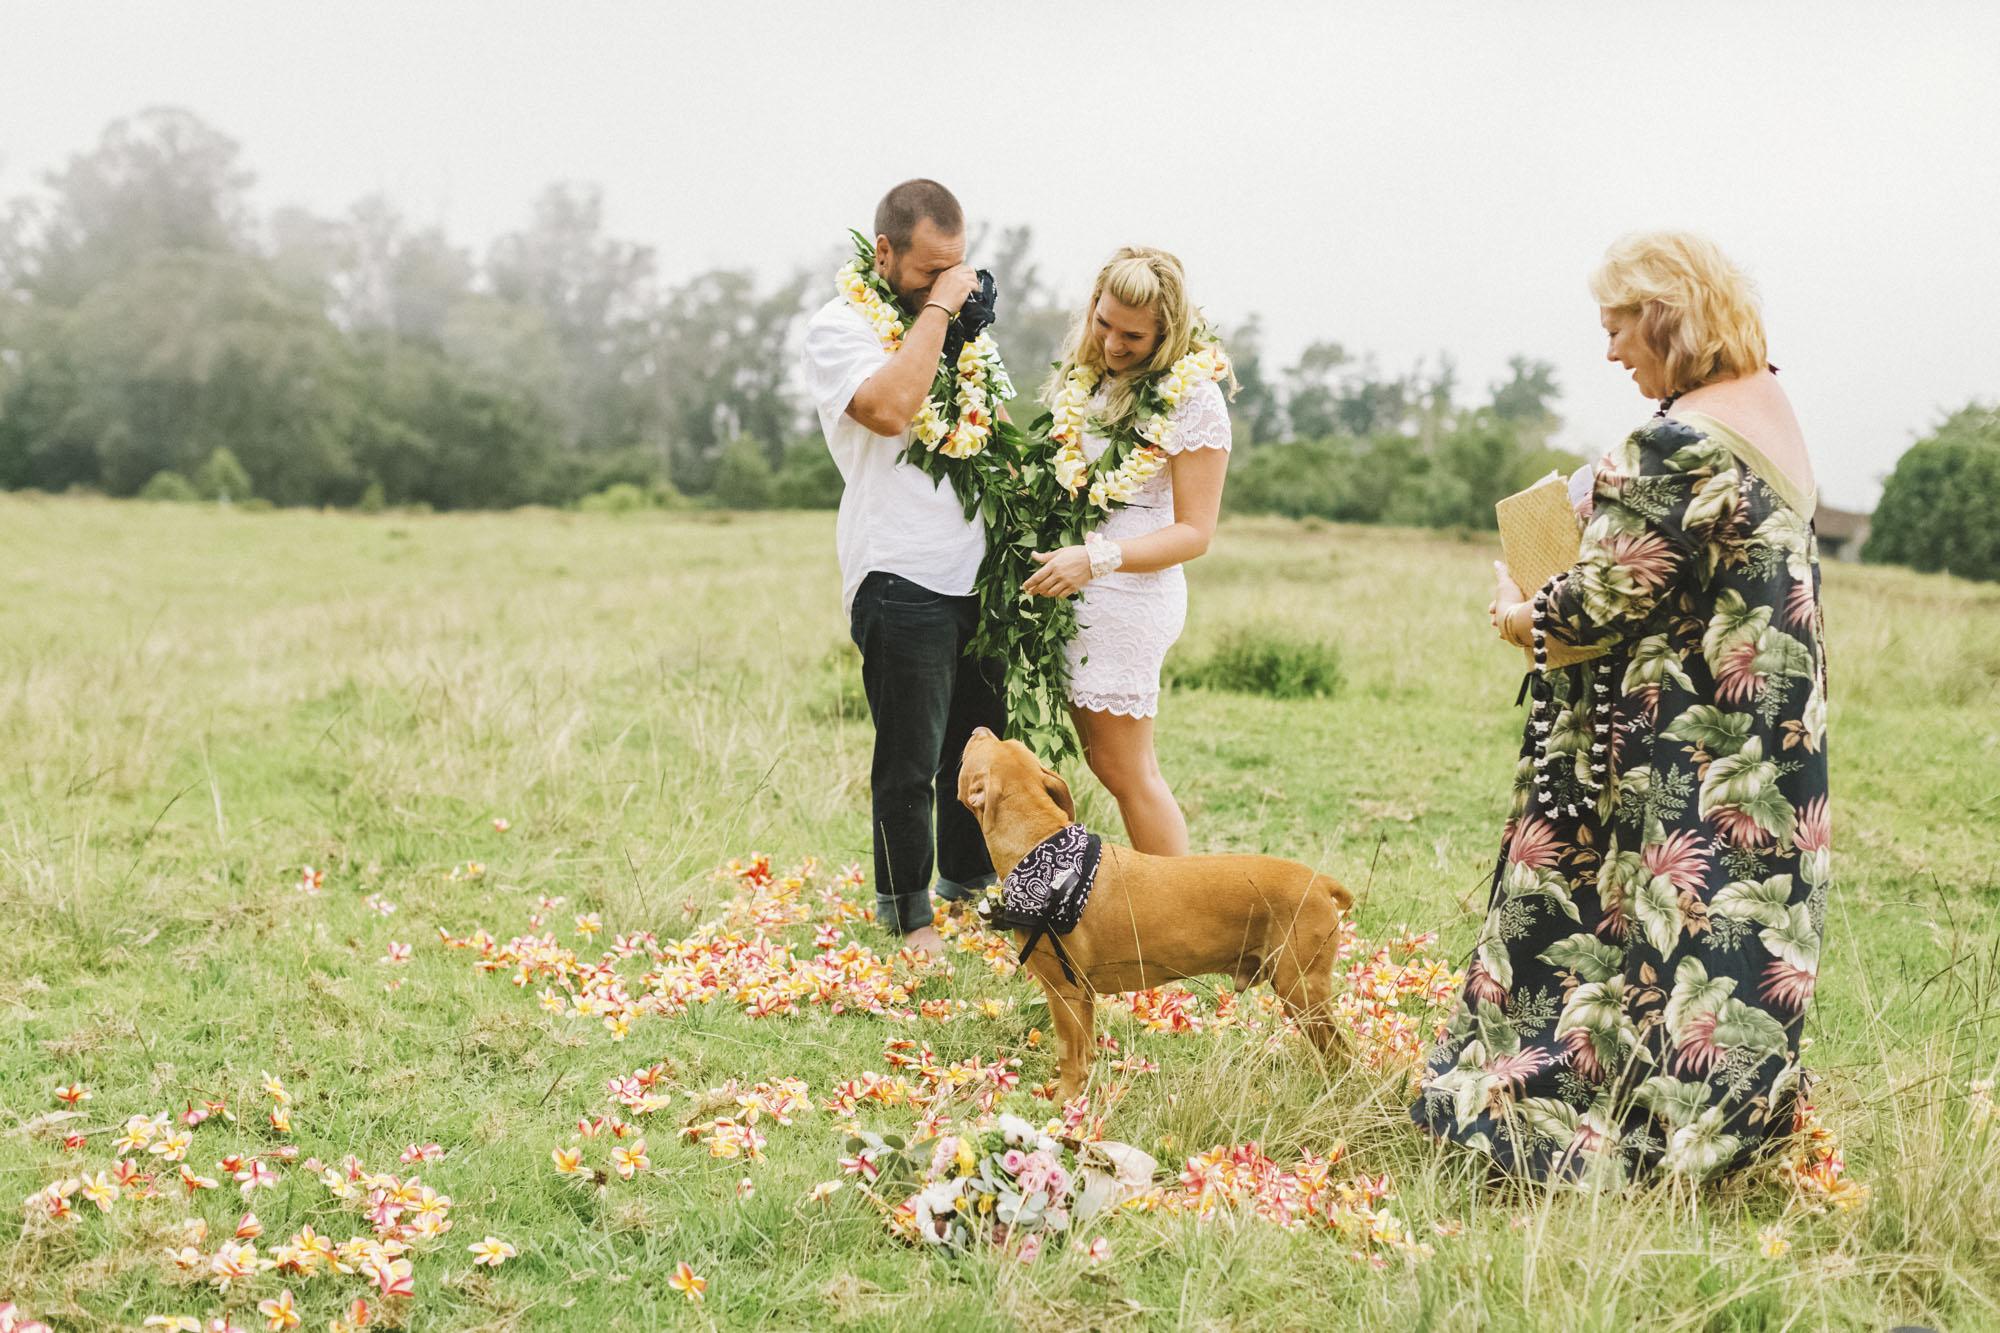 Maui hawaii photographer wedding inspiration_48.jpg